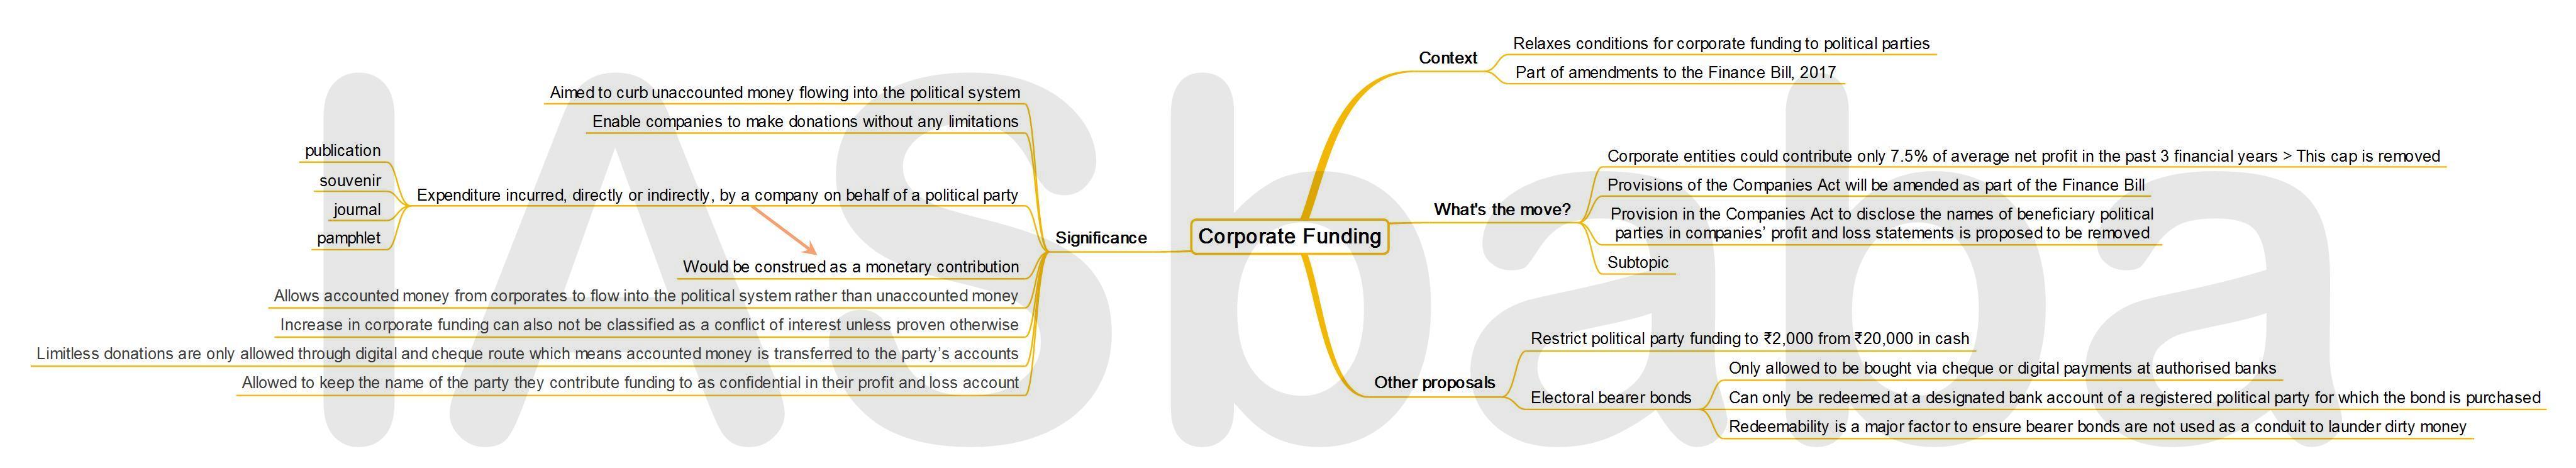 IASbaba's MINDMAP : Issue - Corporate Funding